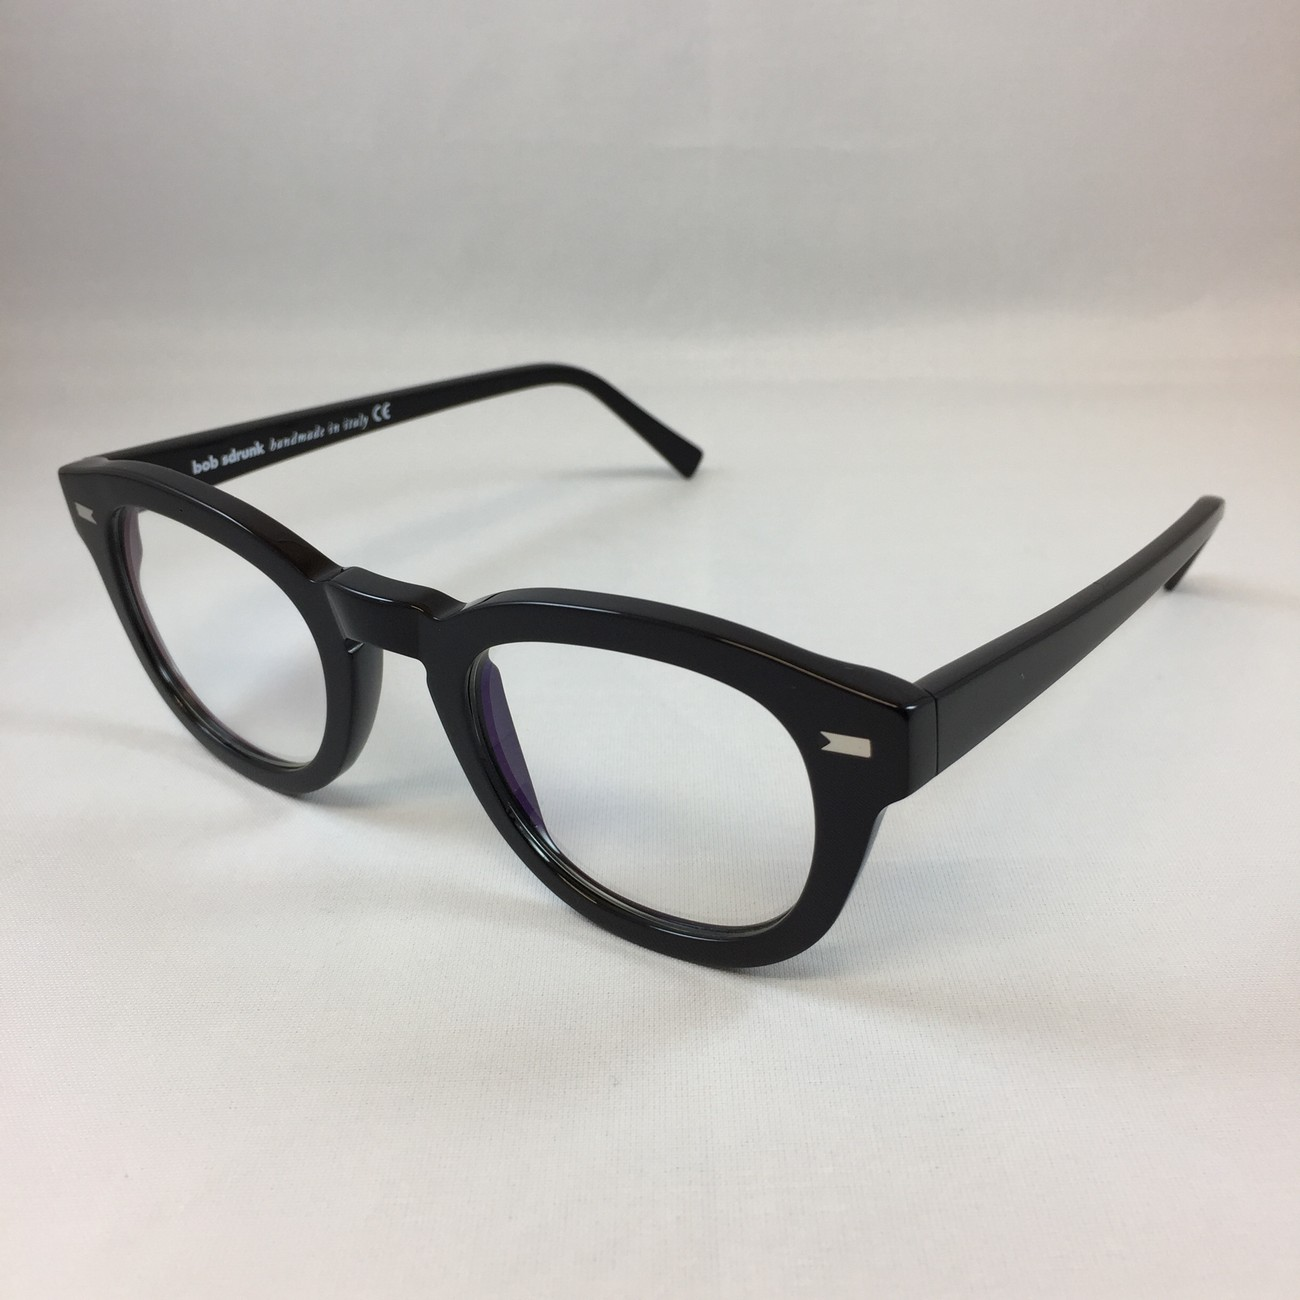 Occhiali da Vista Bob Sdrunk Matt 01 T6Y7eHs